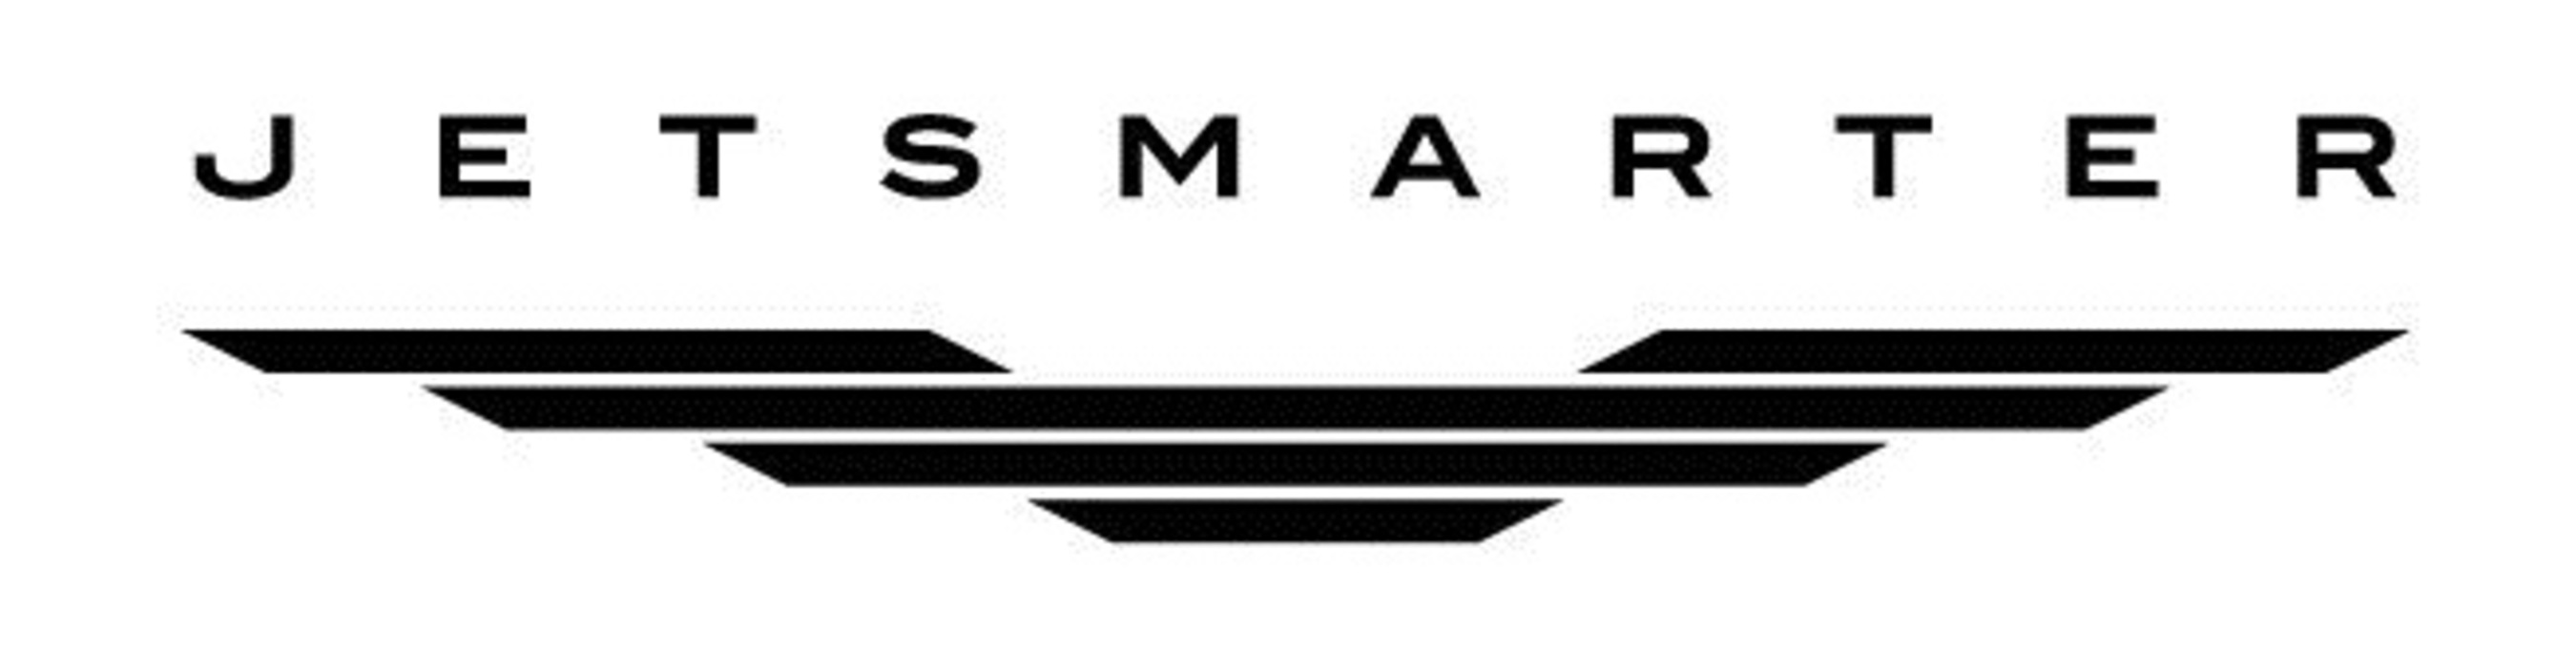 JetSmarter logo.